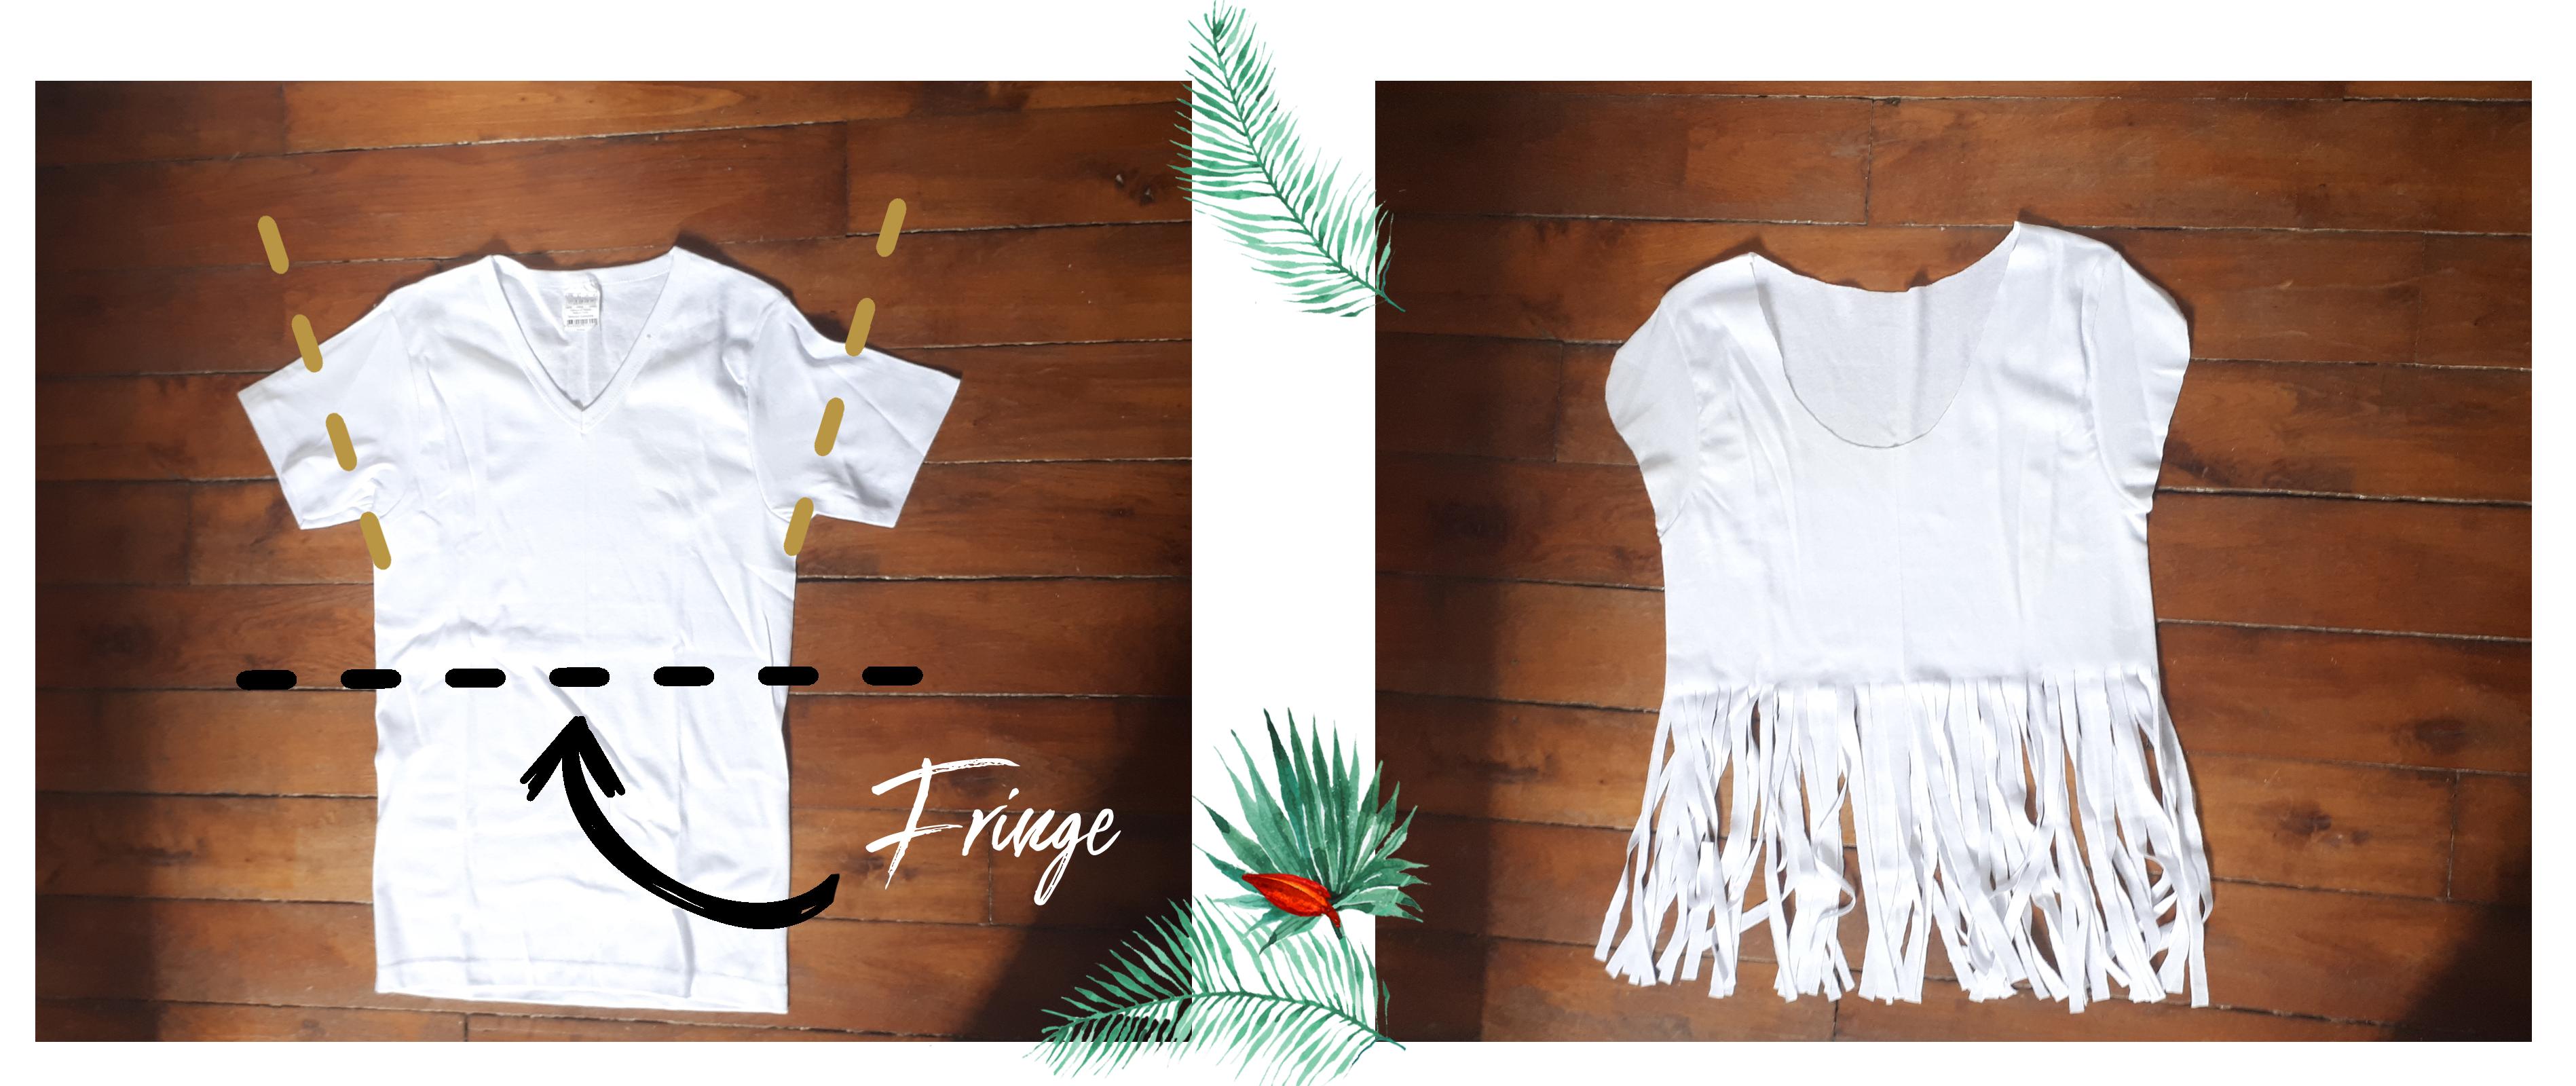 Avant-après-diy-tee-shirt-fringe